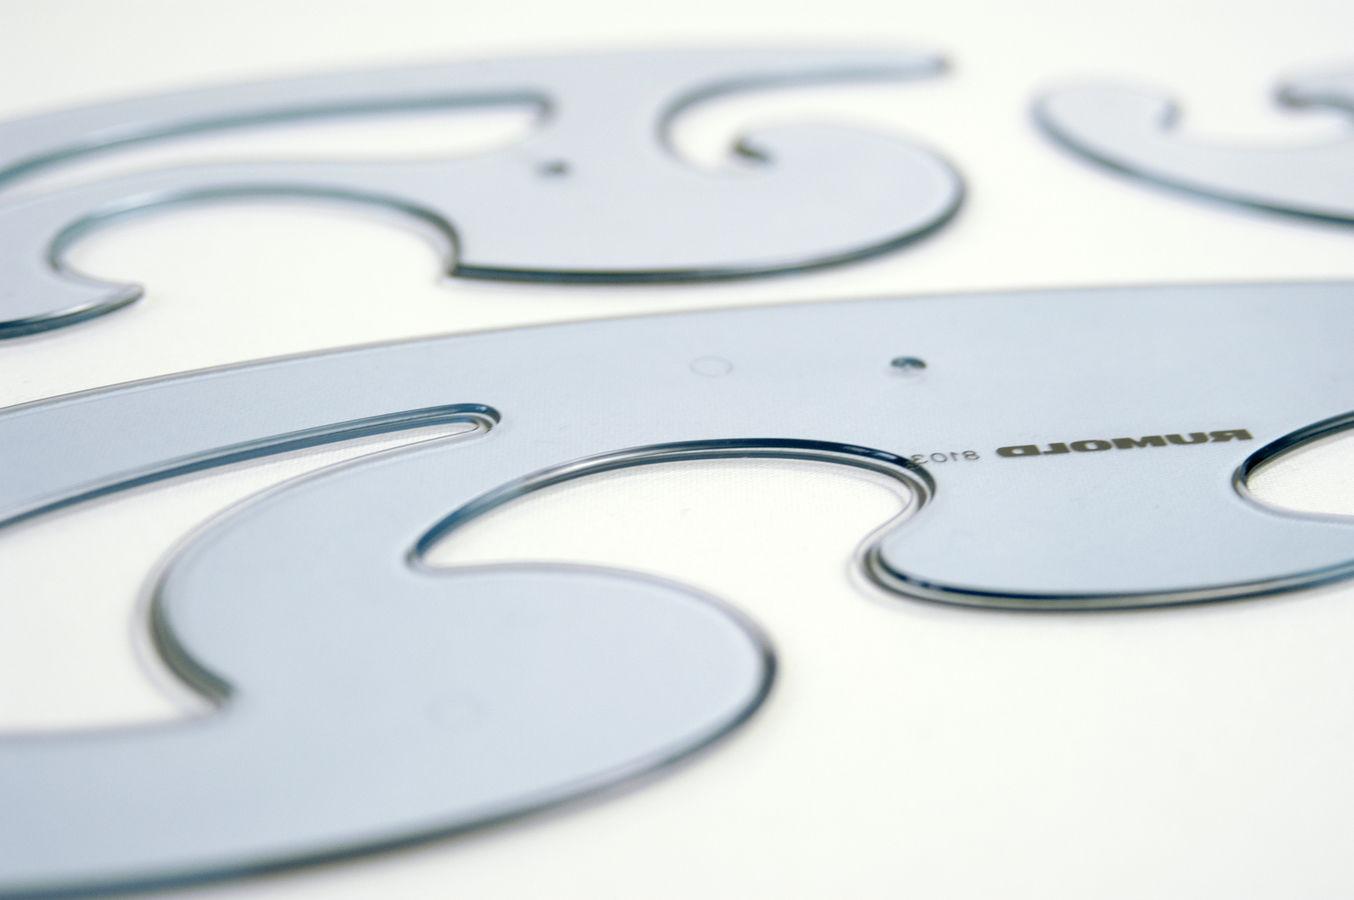 Lieblingsteil kopieren mit der Komplett-Box Schnittmuster fertigen